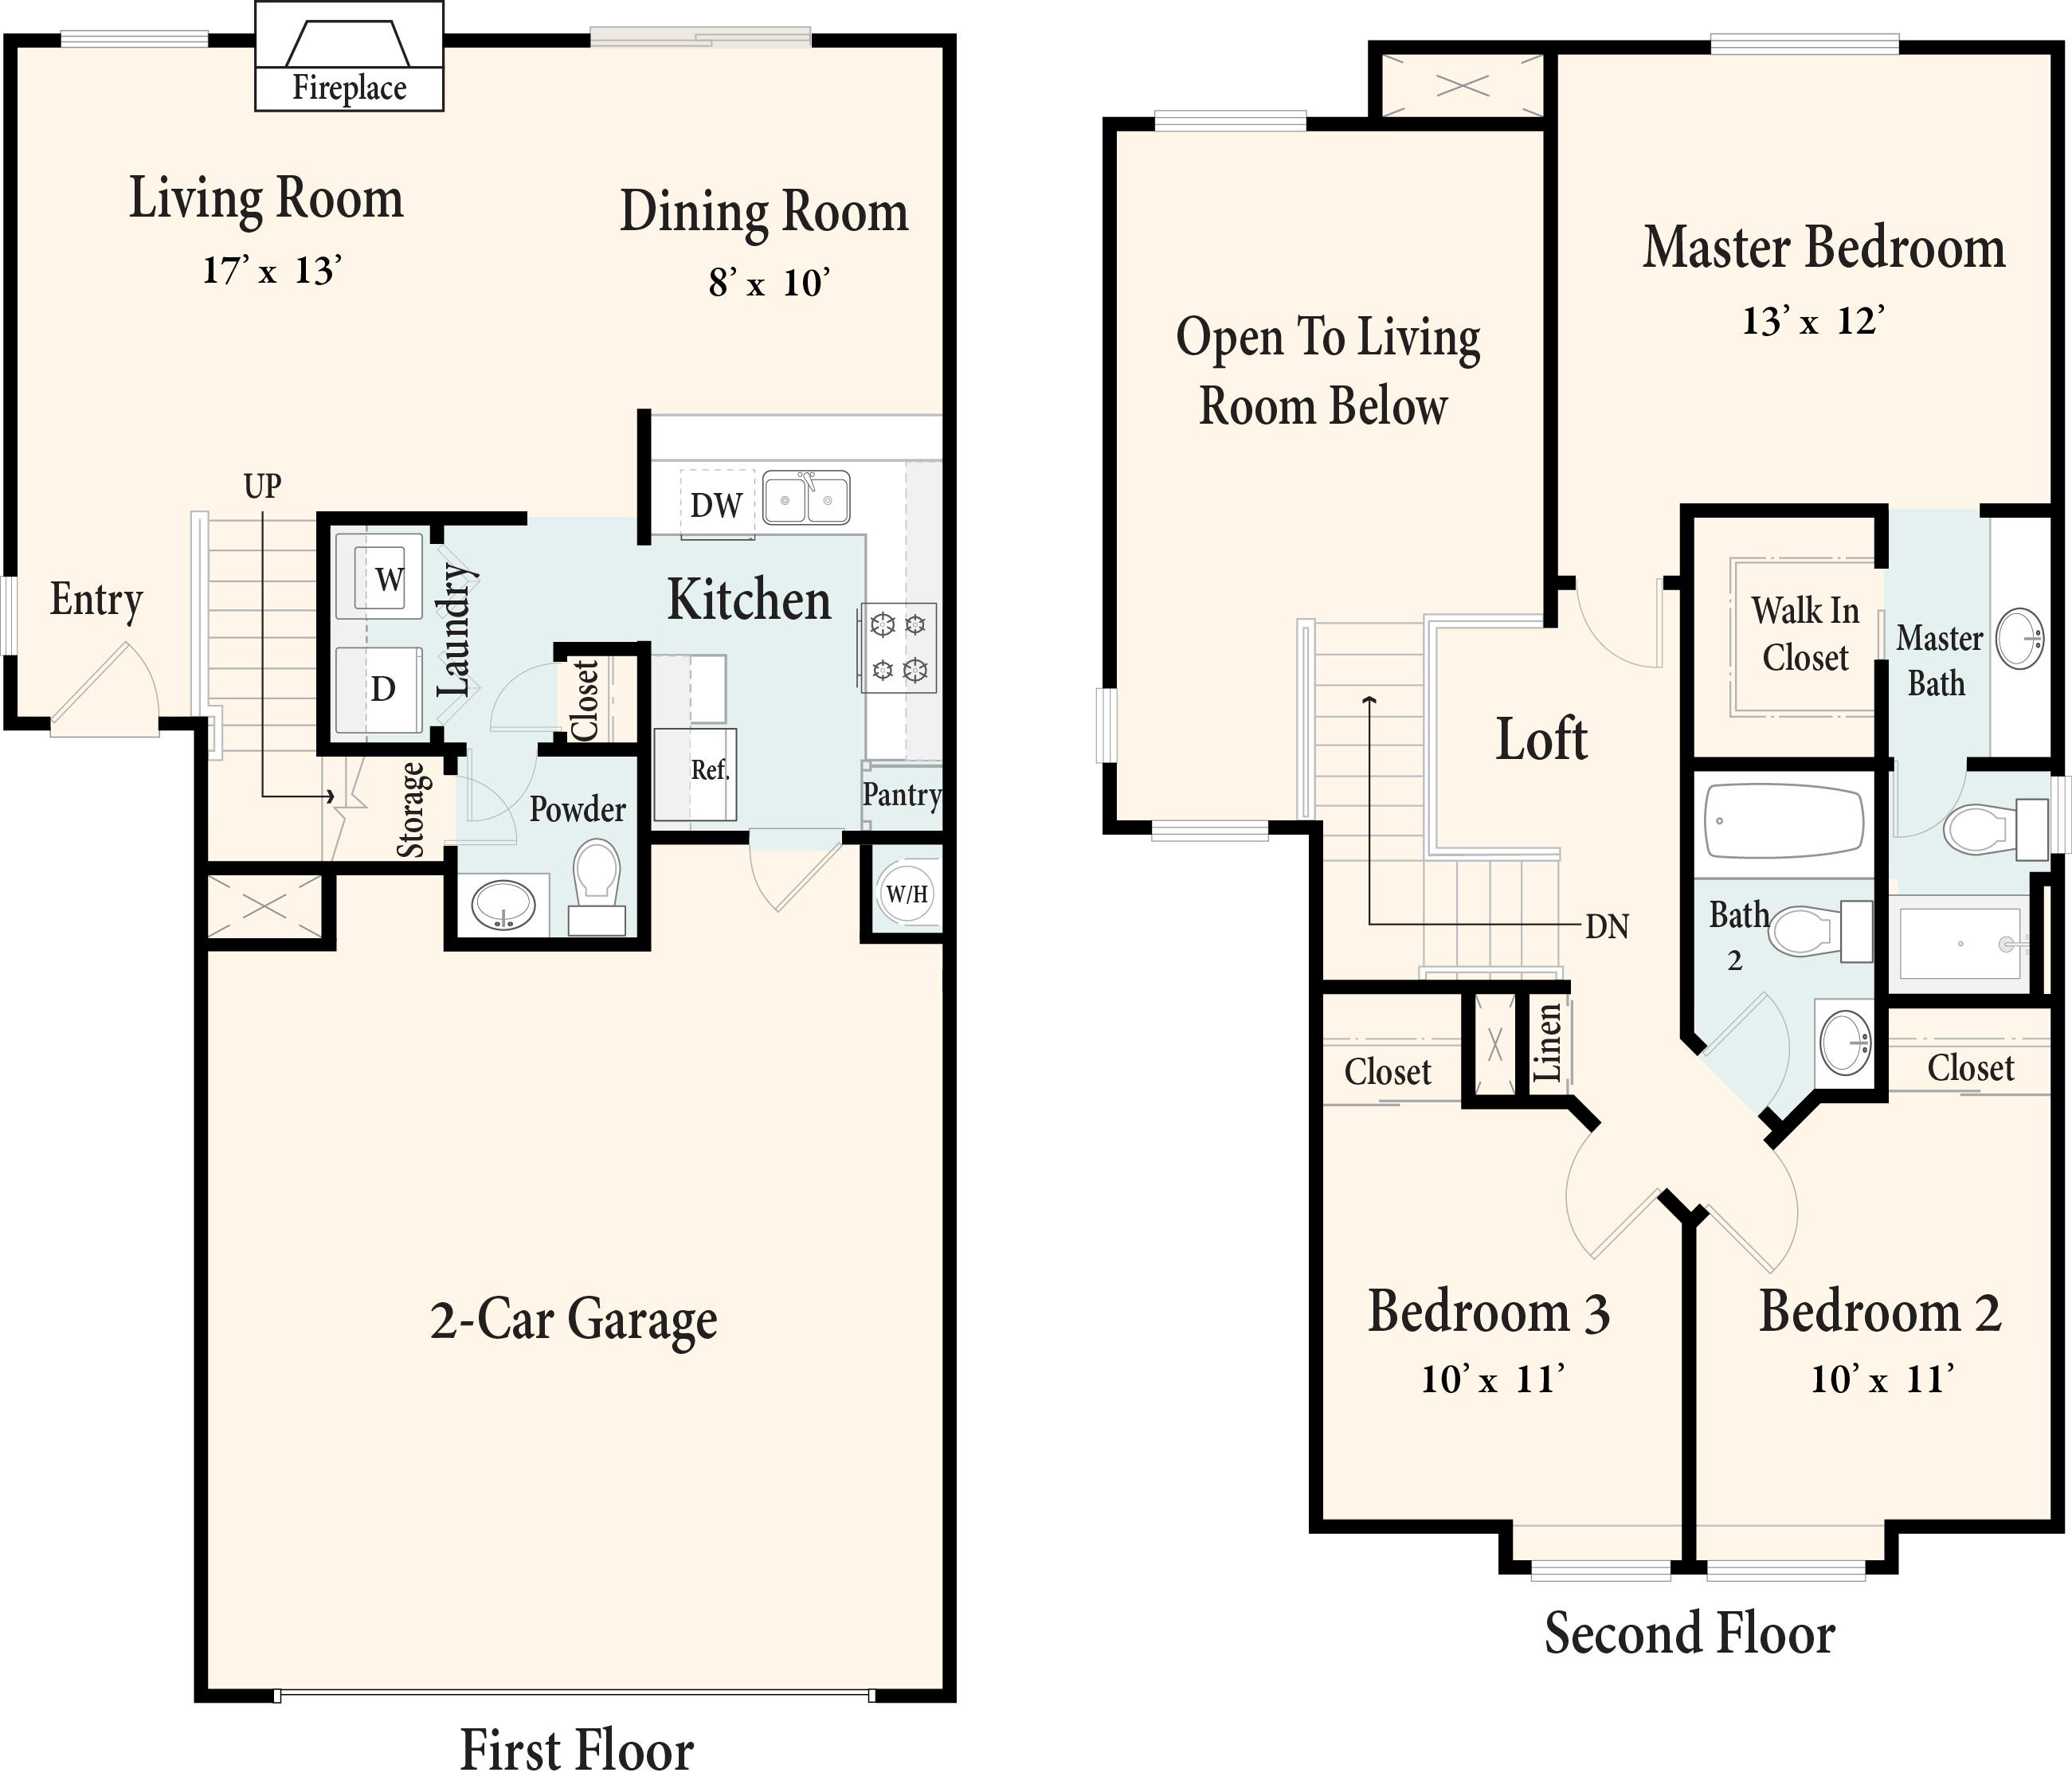 greenvalleycrest valleyvista plan175 rev color jpg 1502730918 view floor plans